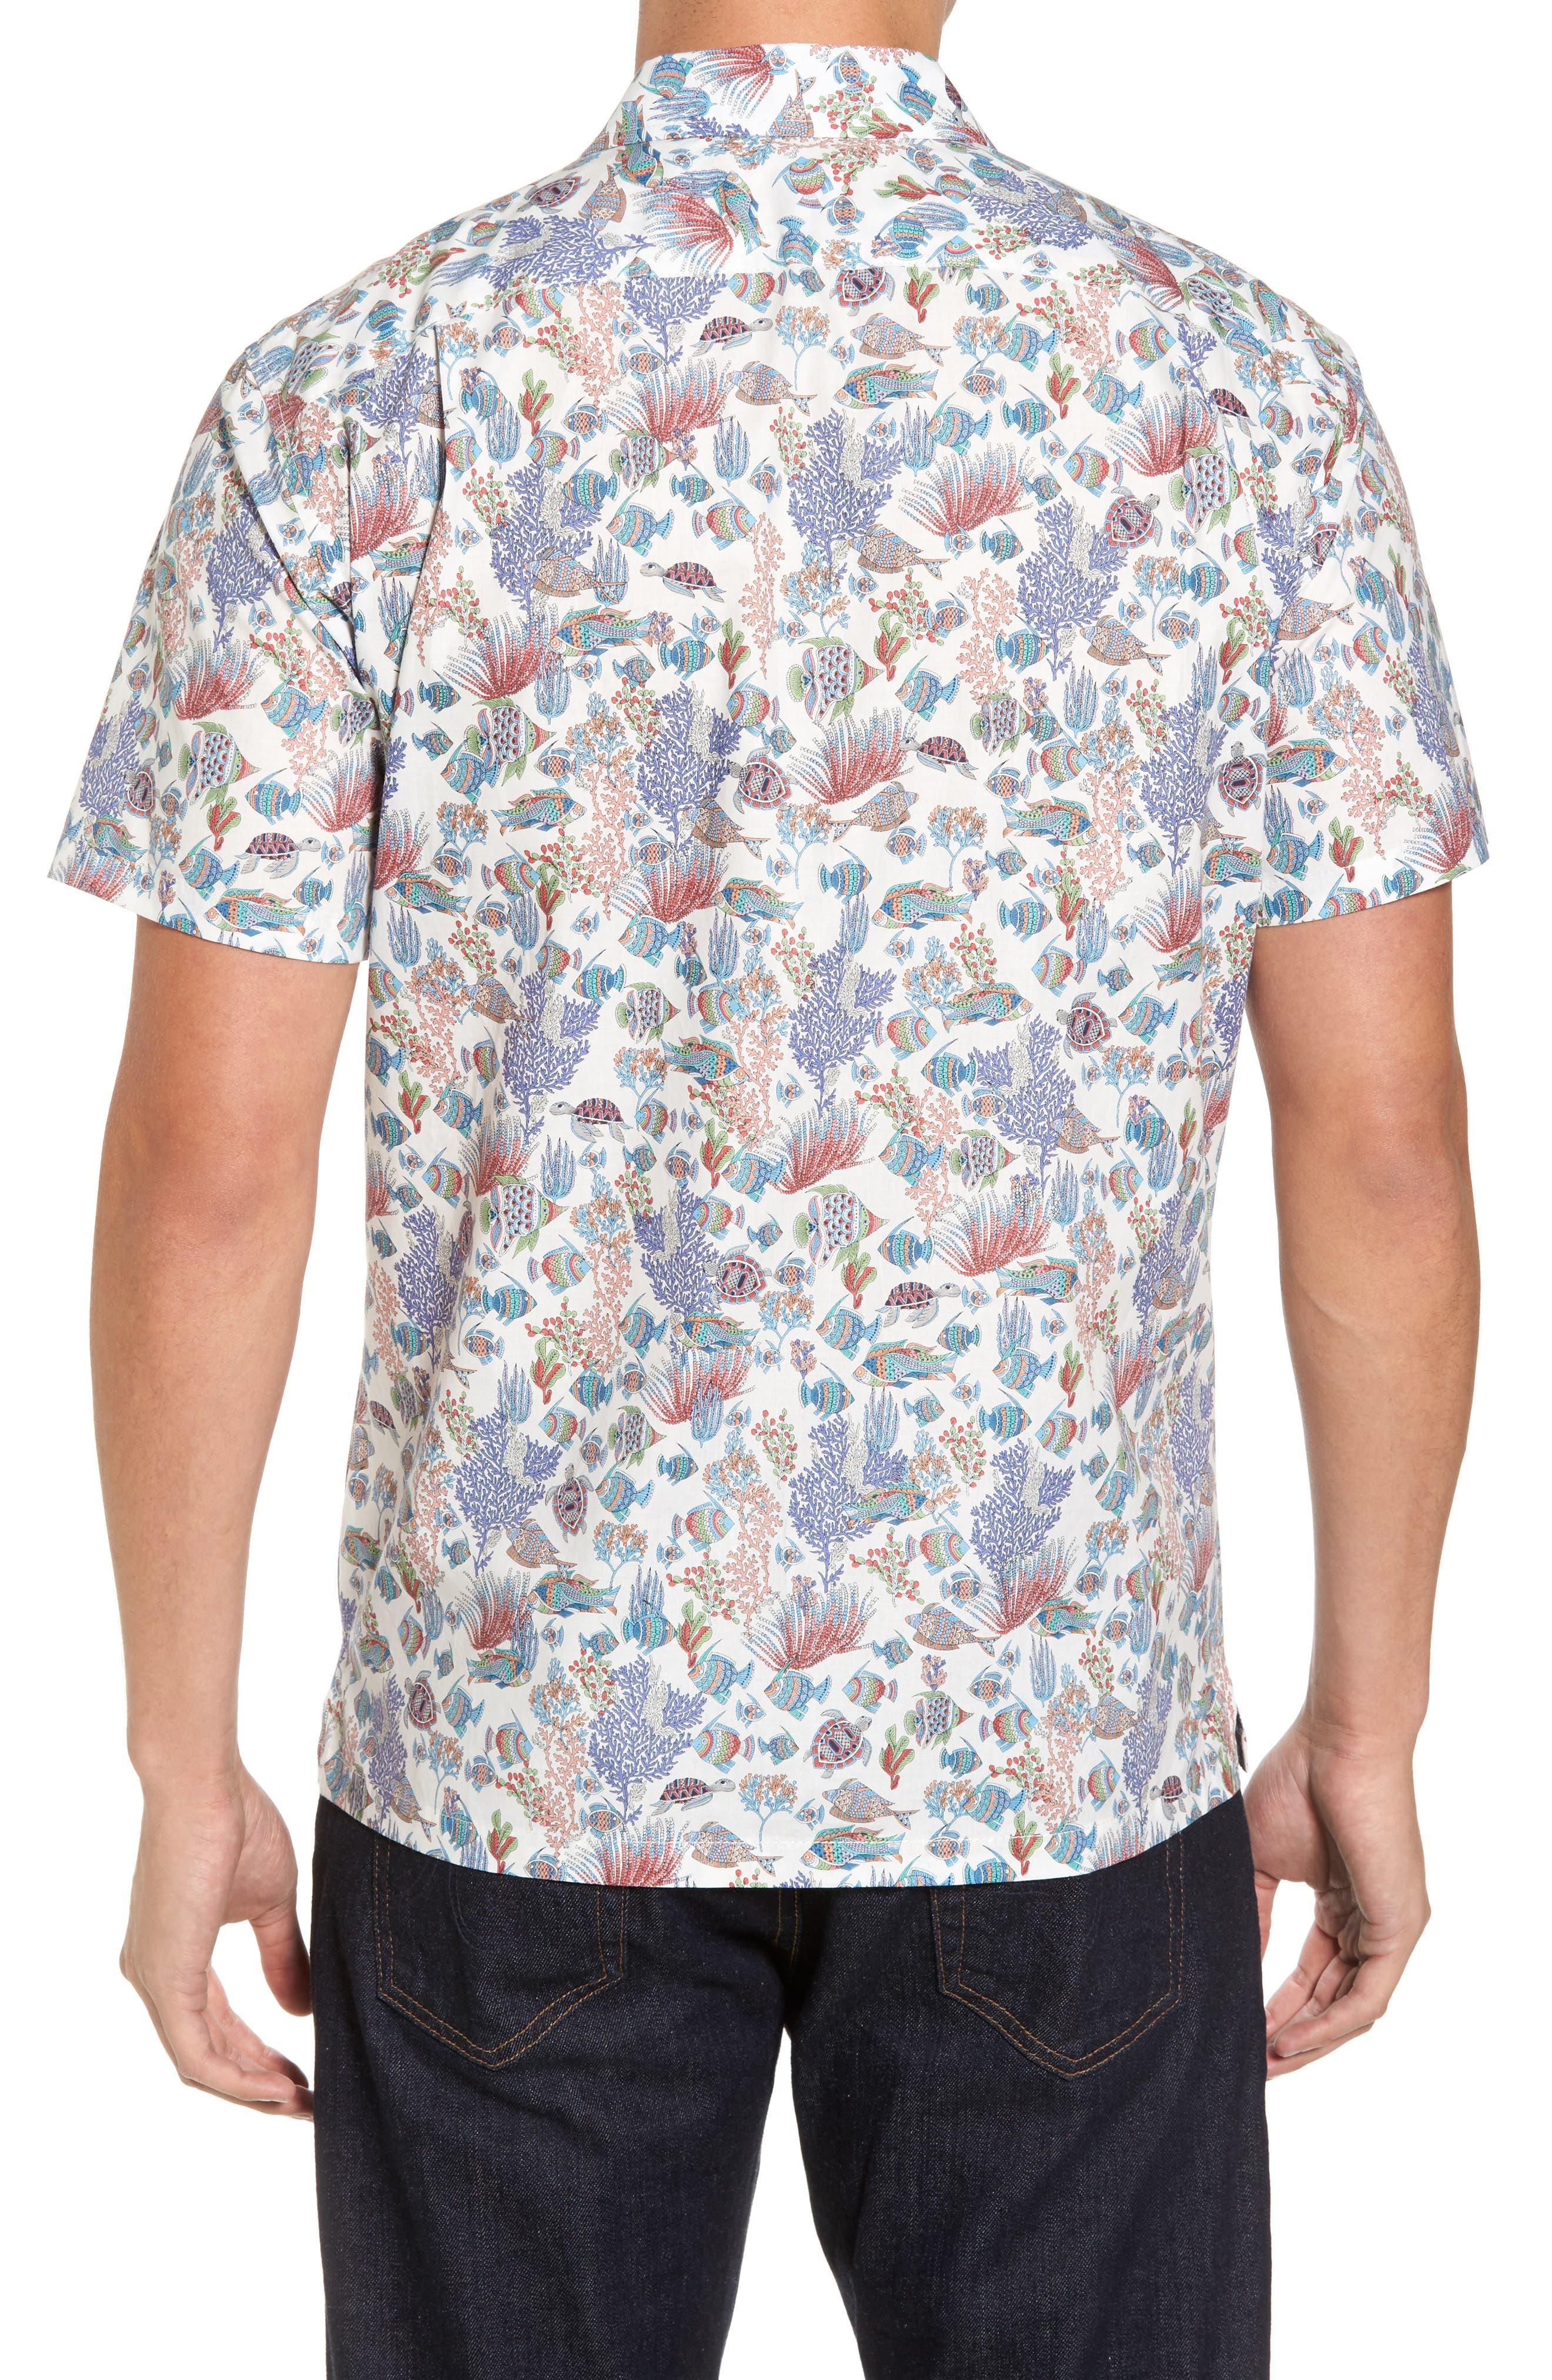 Aquaculture Slim Fit Camp Shirt,                             Alternate thumbnail 2, color,                             100